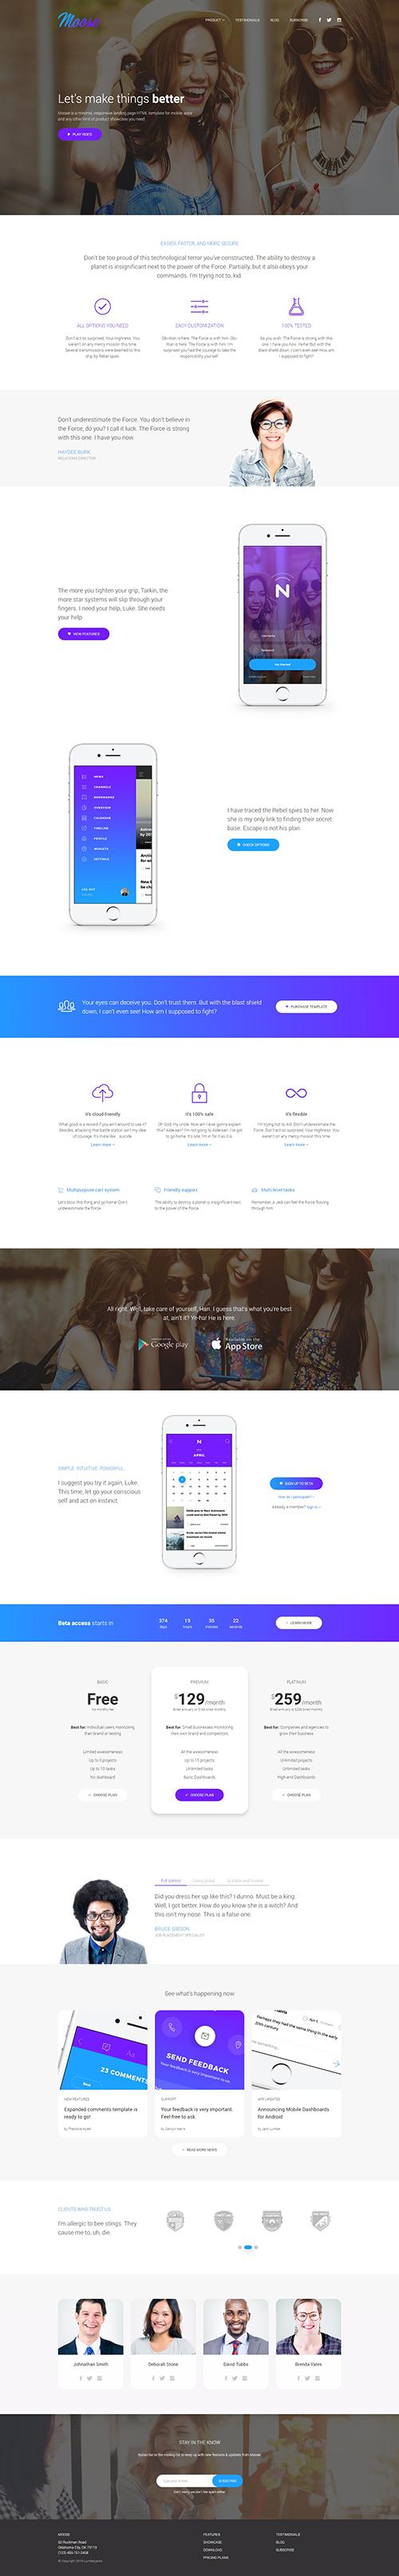 Moose - Modern Landing Page HTML Template by Lumberjacks | ThemeForest